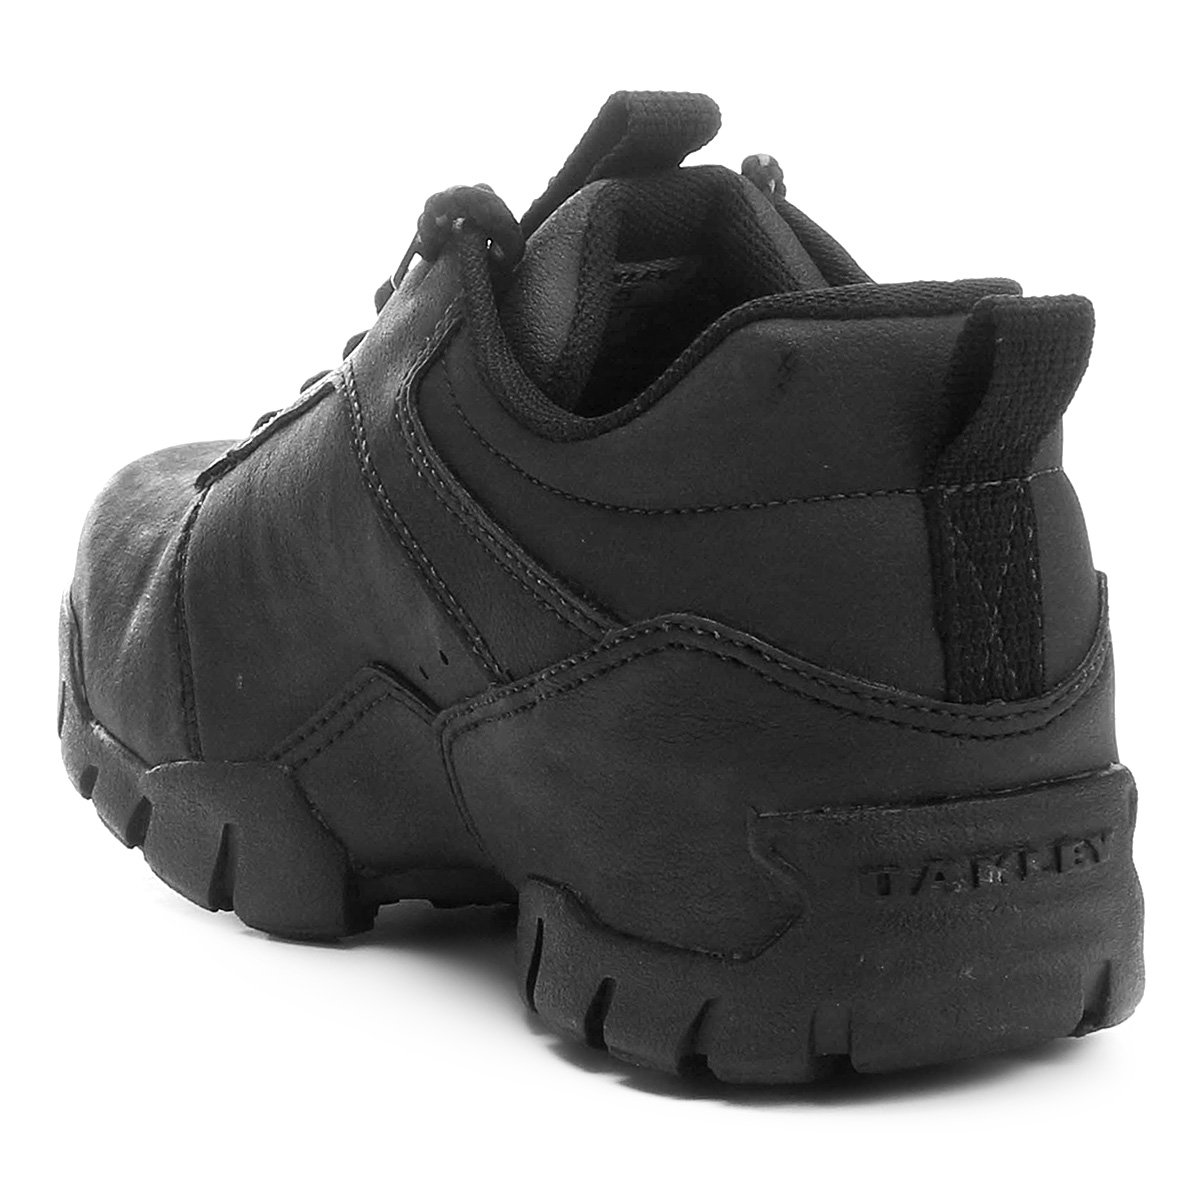 cadc4d6e94b5a Tênis Couro Oakley Enduro Masculino - Preto - Compre Agora   Netshoes